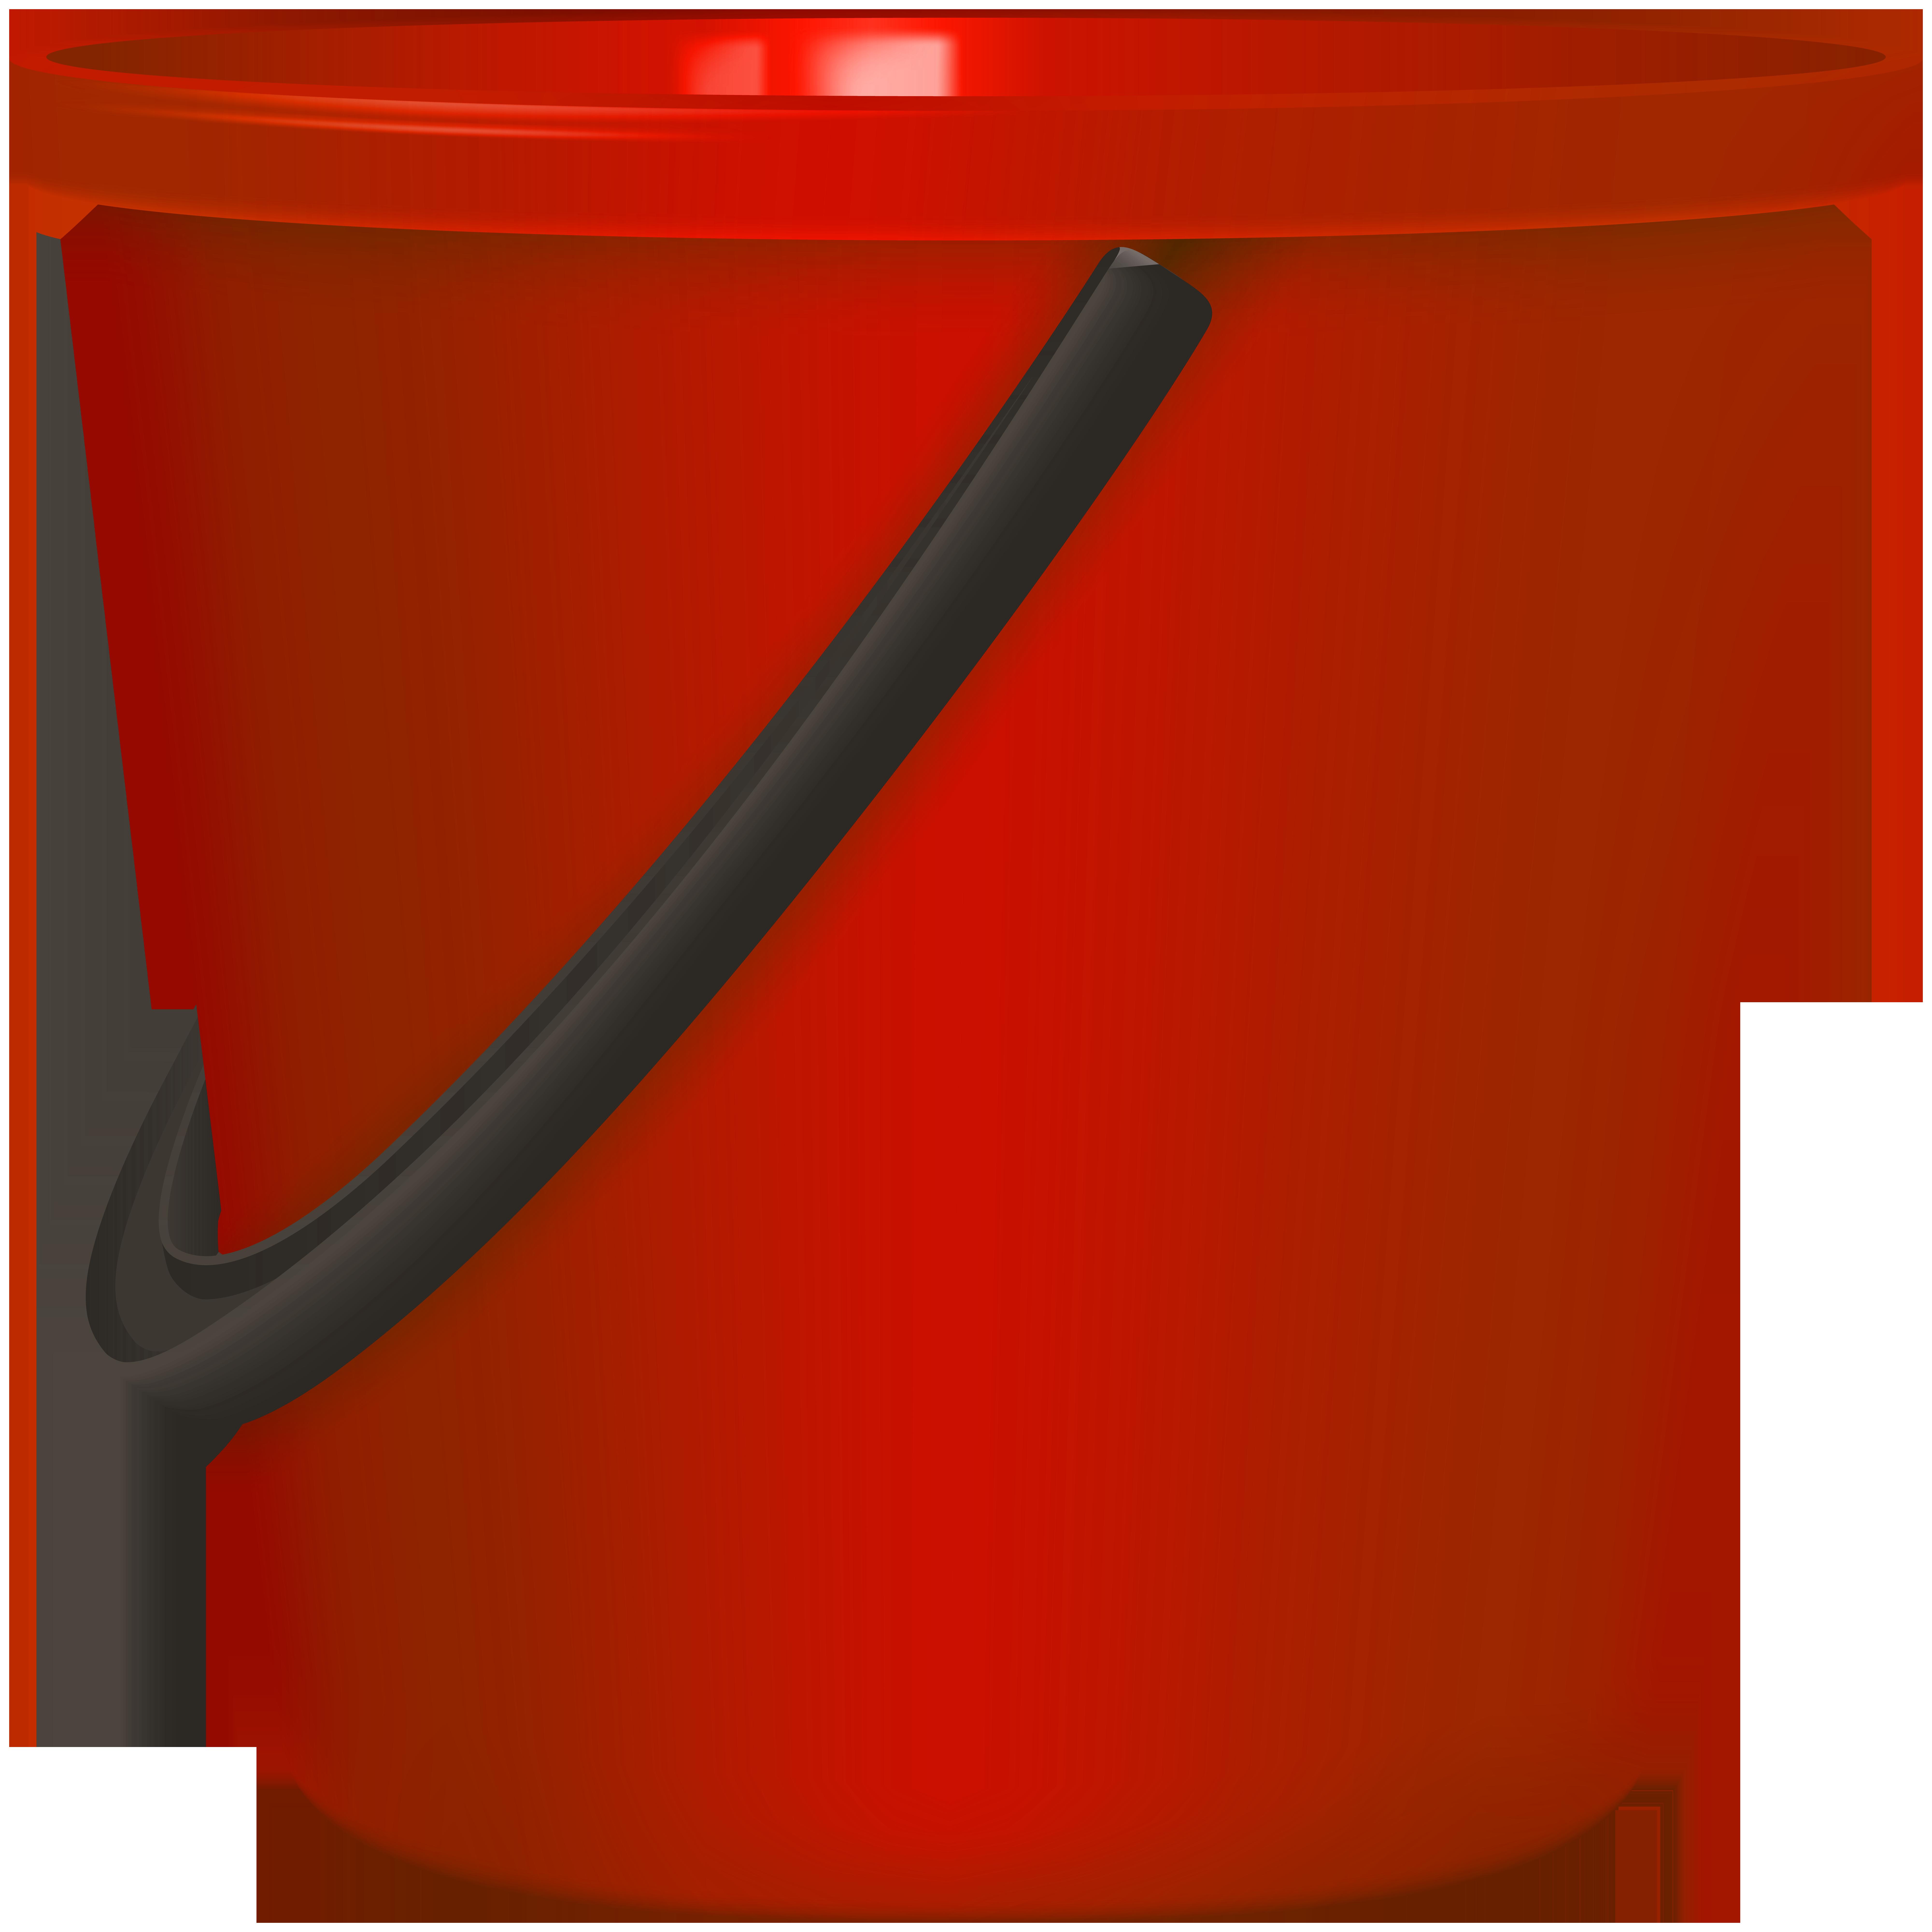 Red Bucket PNG Clip Art.